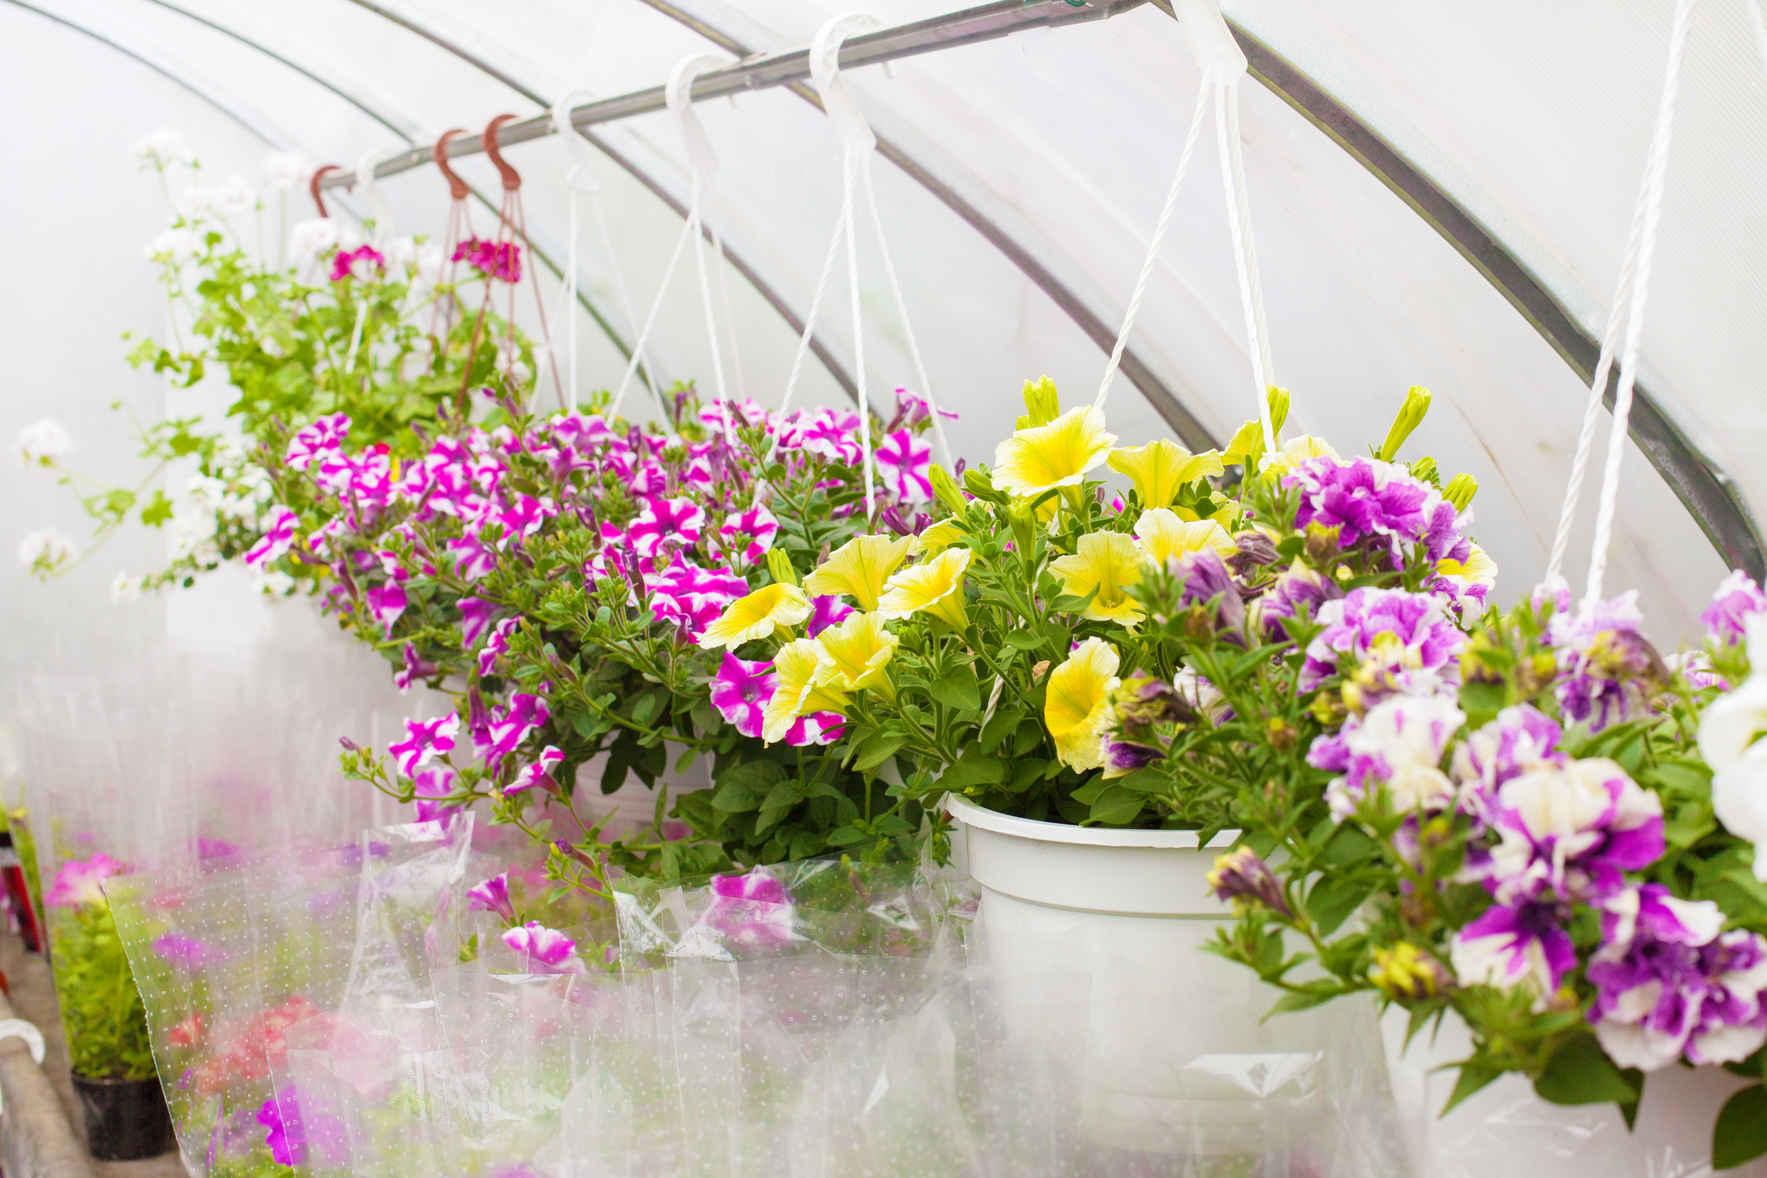 FOCA Annual Plant Sale image